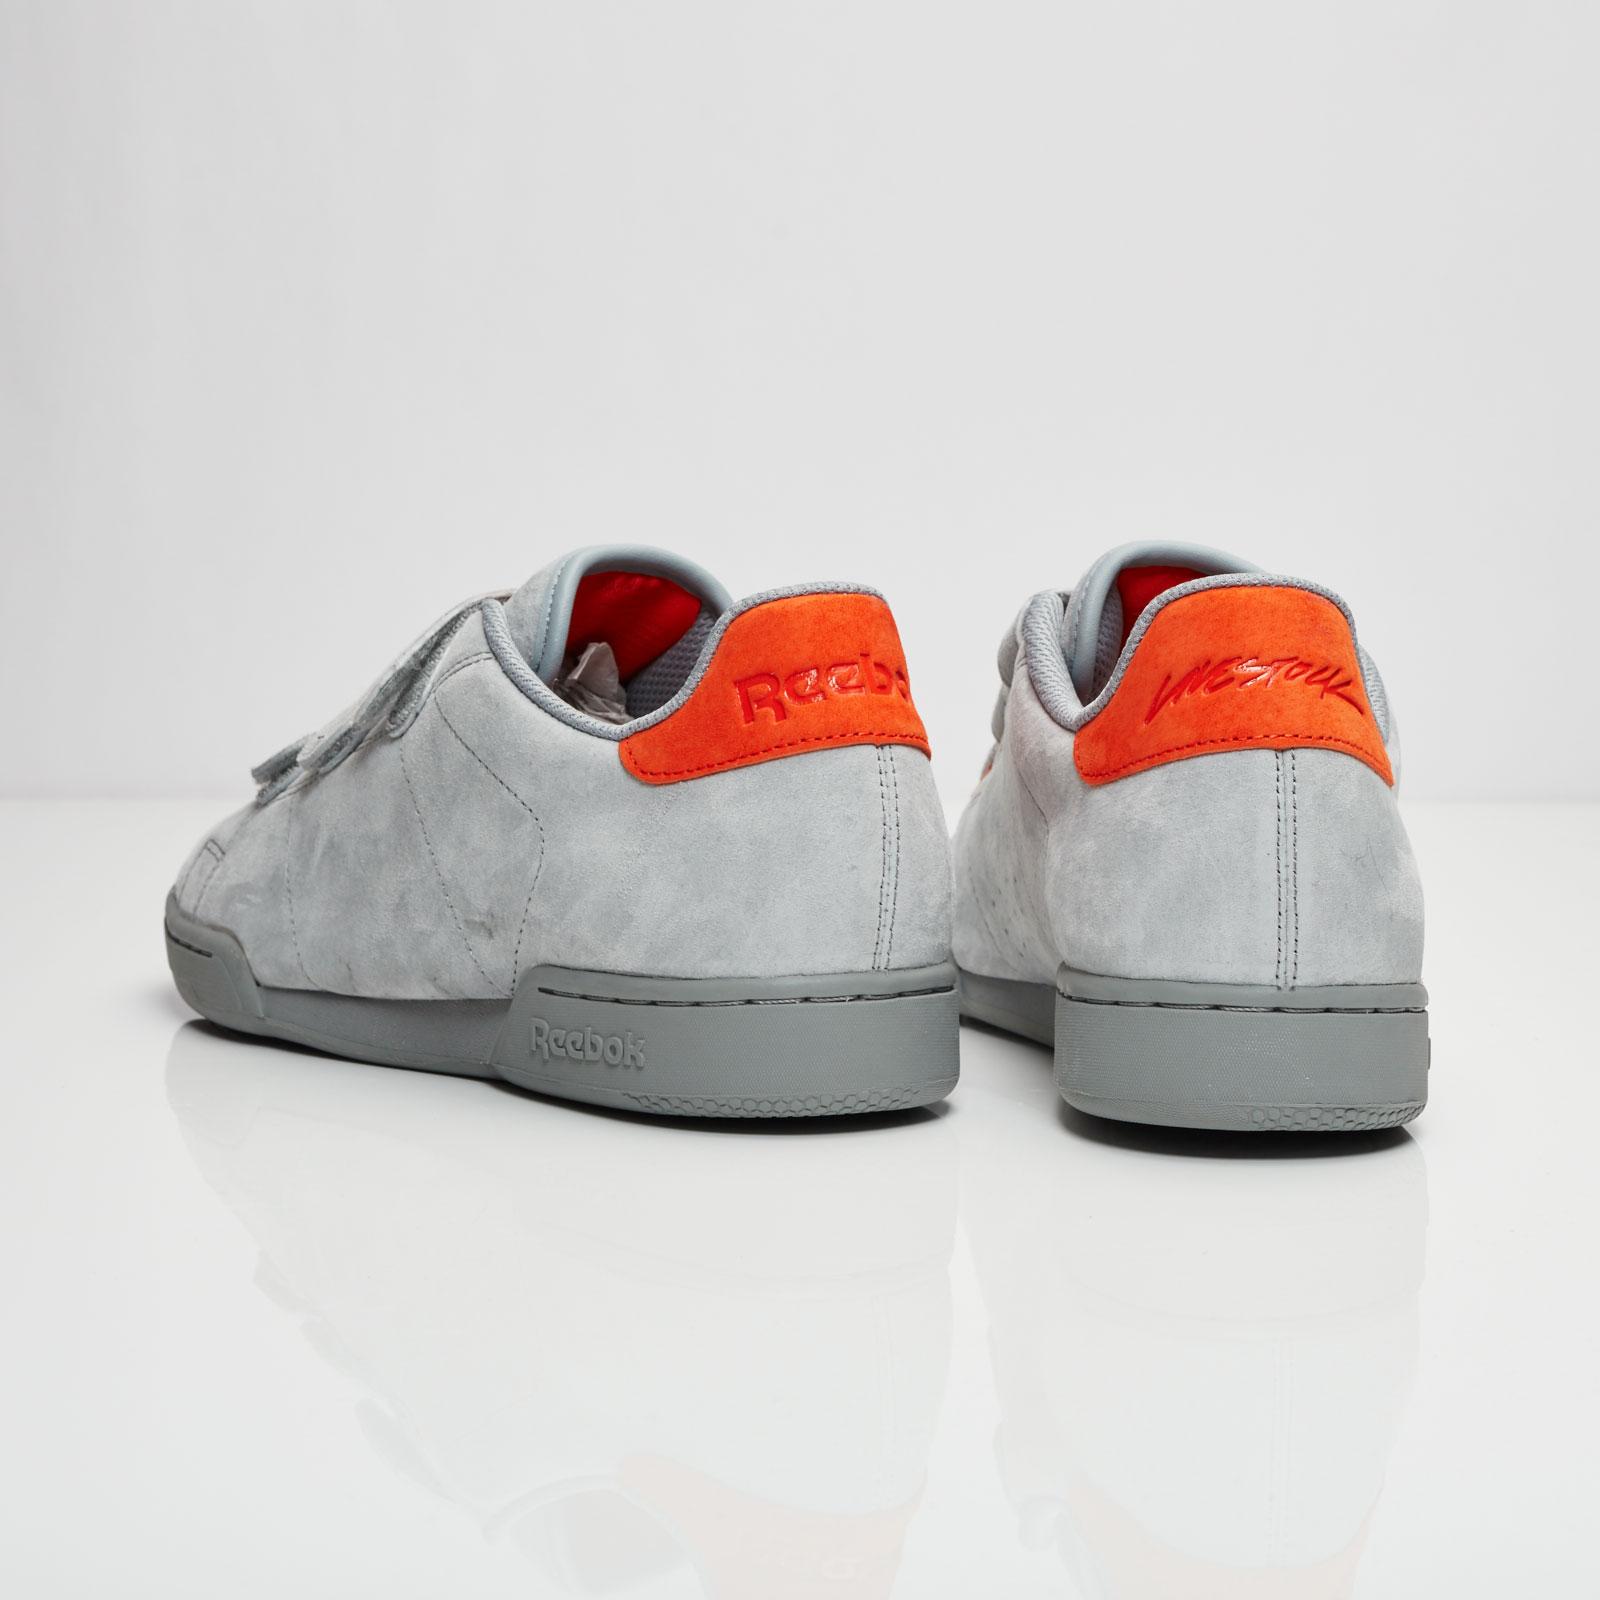 aea78ab04bf Reebok NPC Straps CN - Ar2594 - Sneakersnstuff